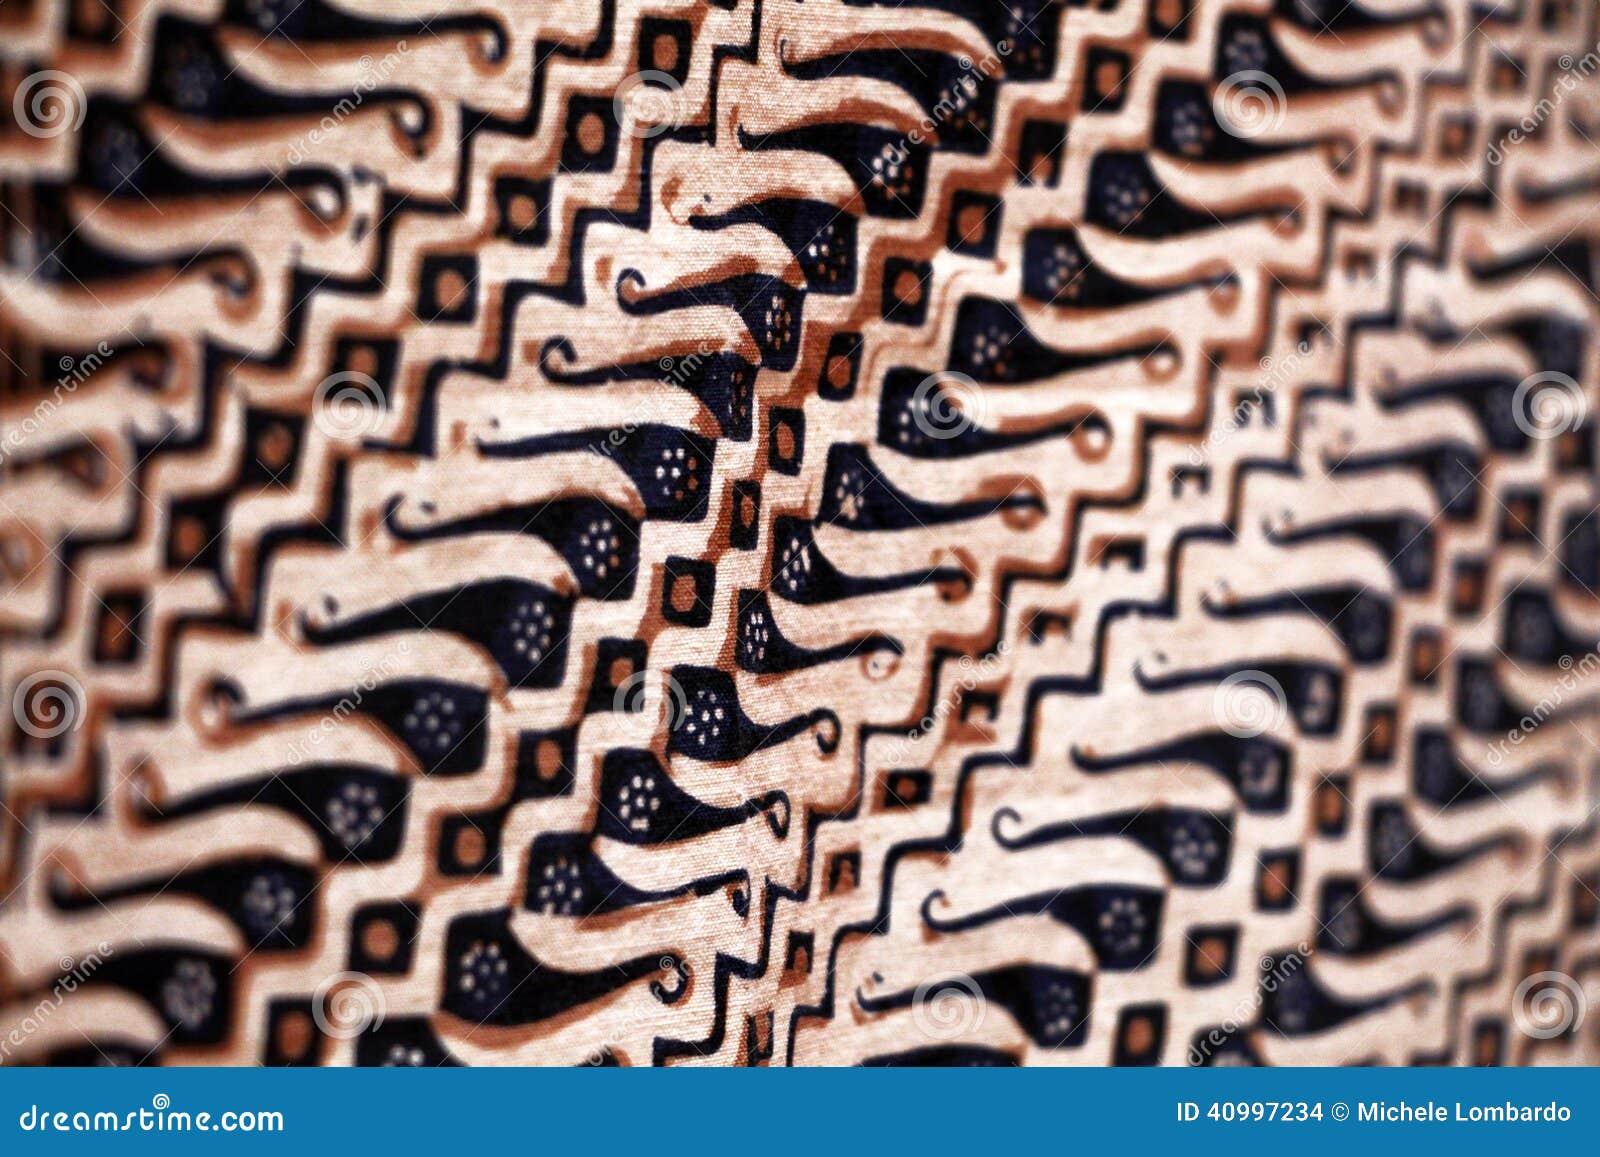 tissu de java indon sie peinture de batik photo stock. Black Bedroom Furniture Sets. Home Design Ideas